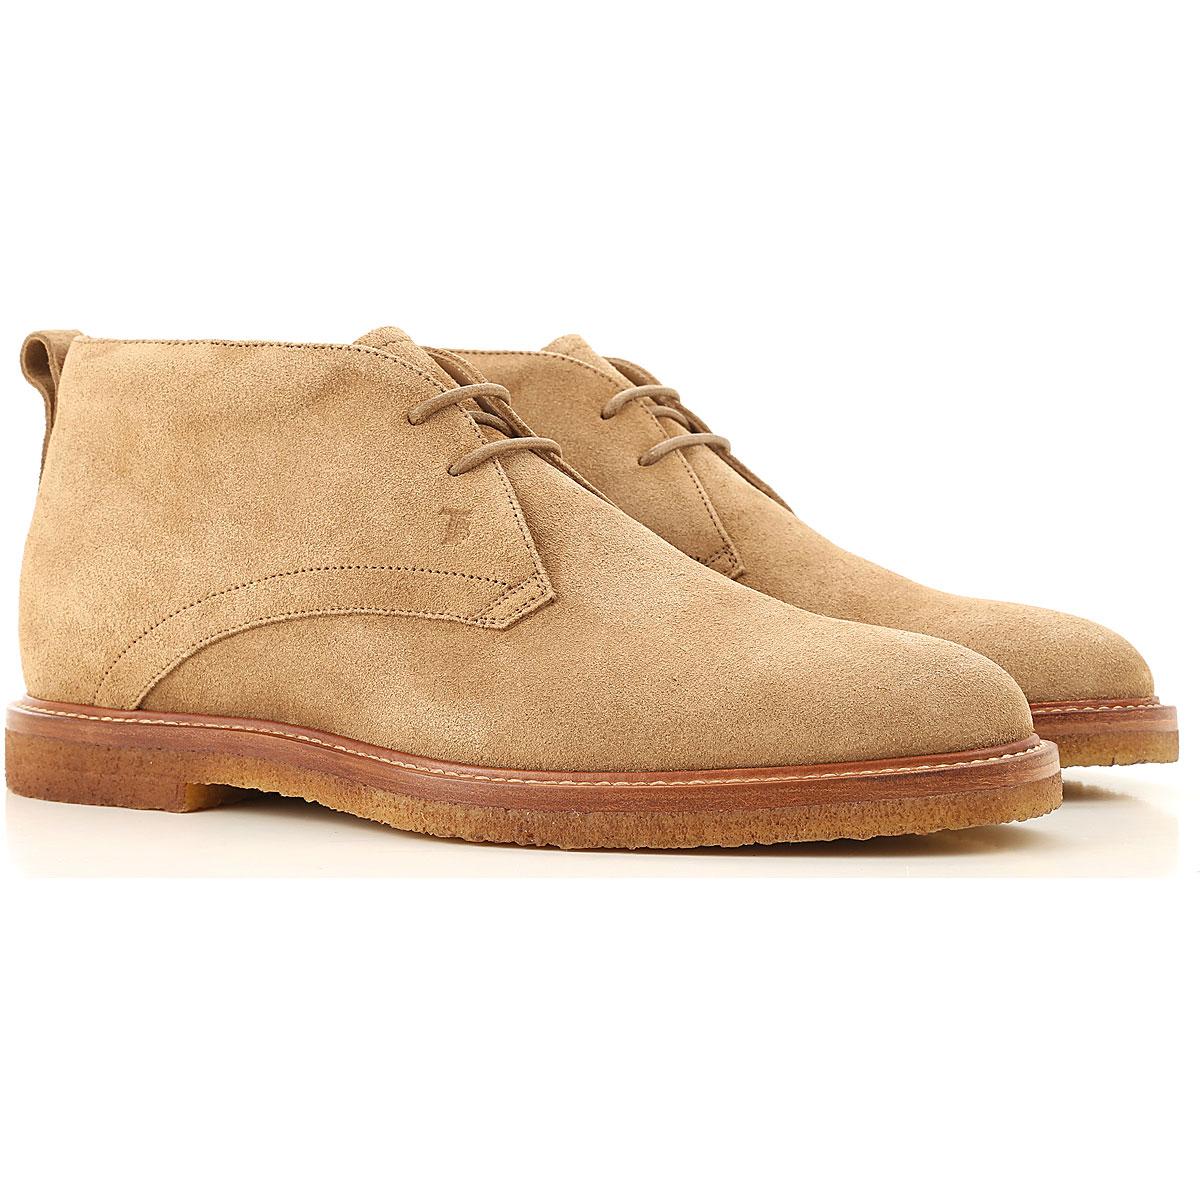 Tods Boots for Men, Booties On Sale, Beige, suede, 2019, 10 10.5 11 12 14 8.5 9.5